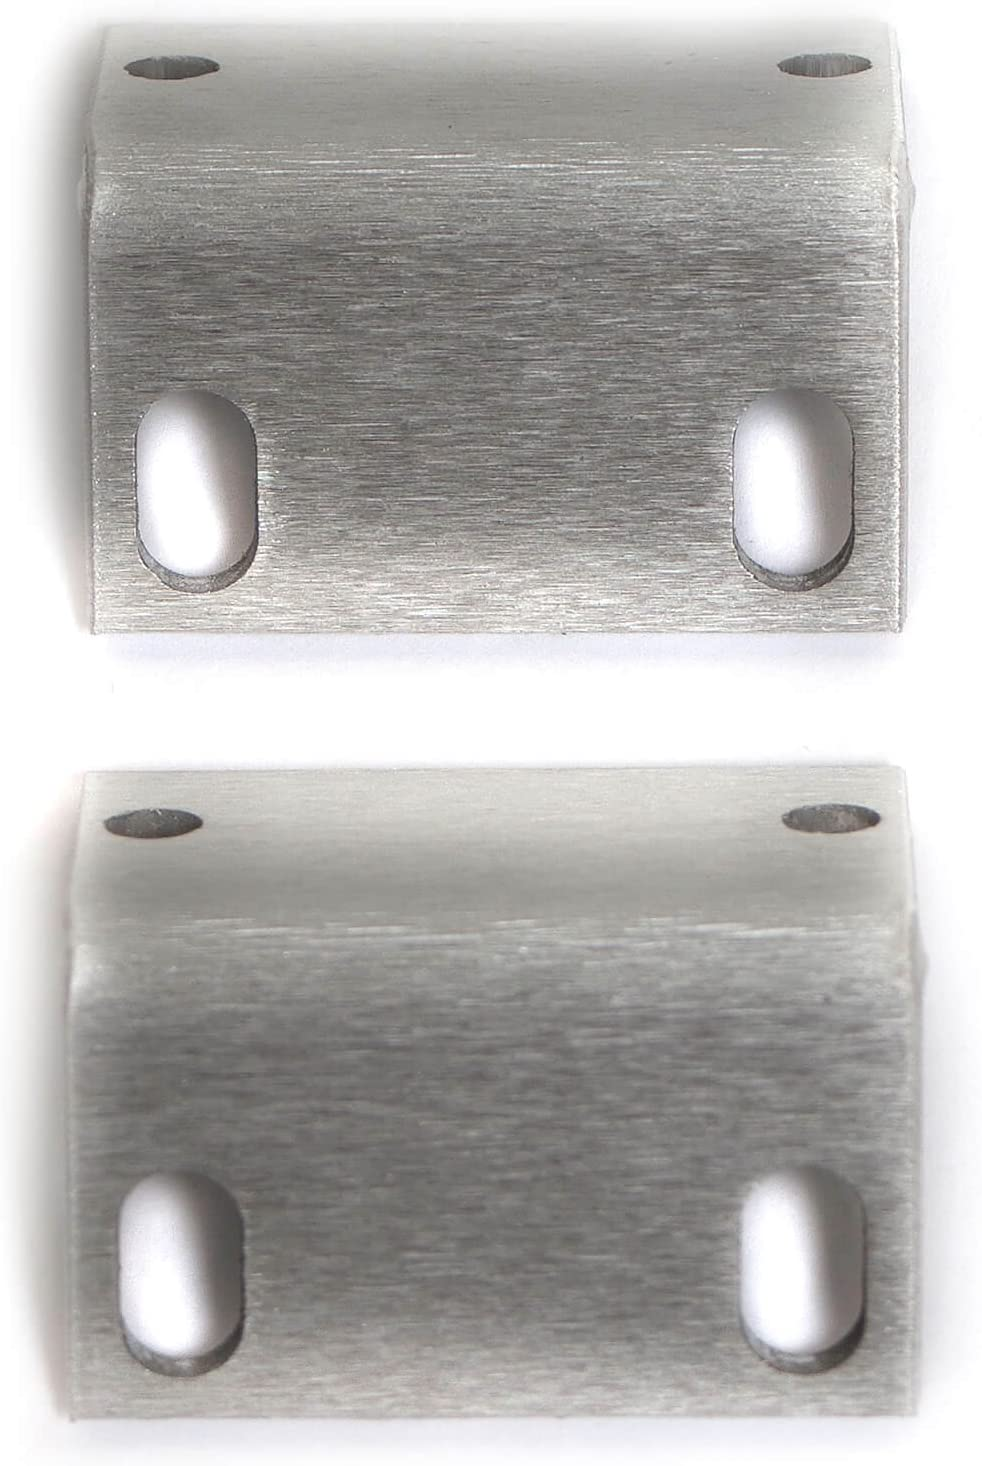 Modular Rackmount Ears 1U Eurorack Brackets by Synthrotek